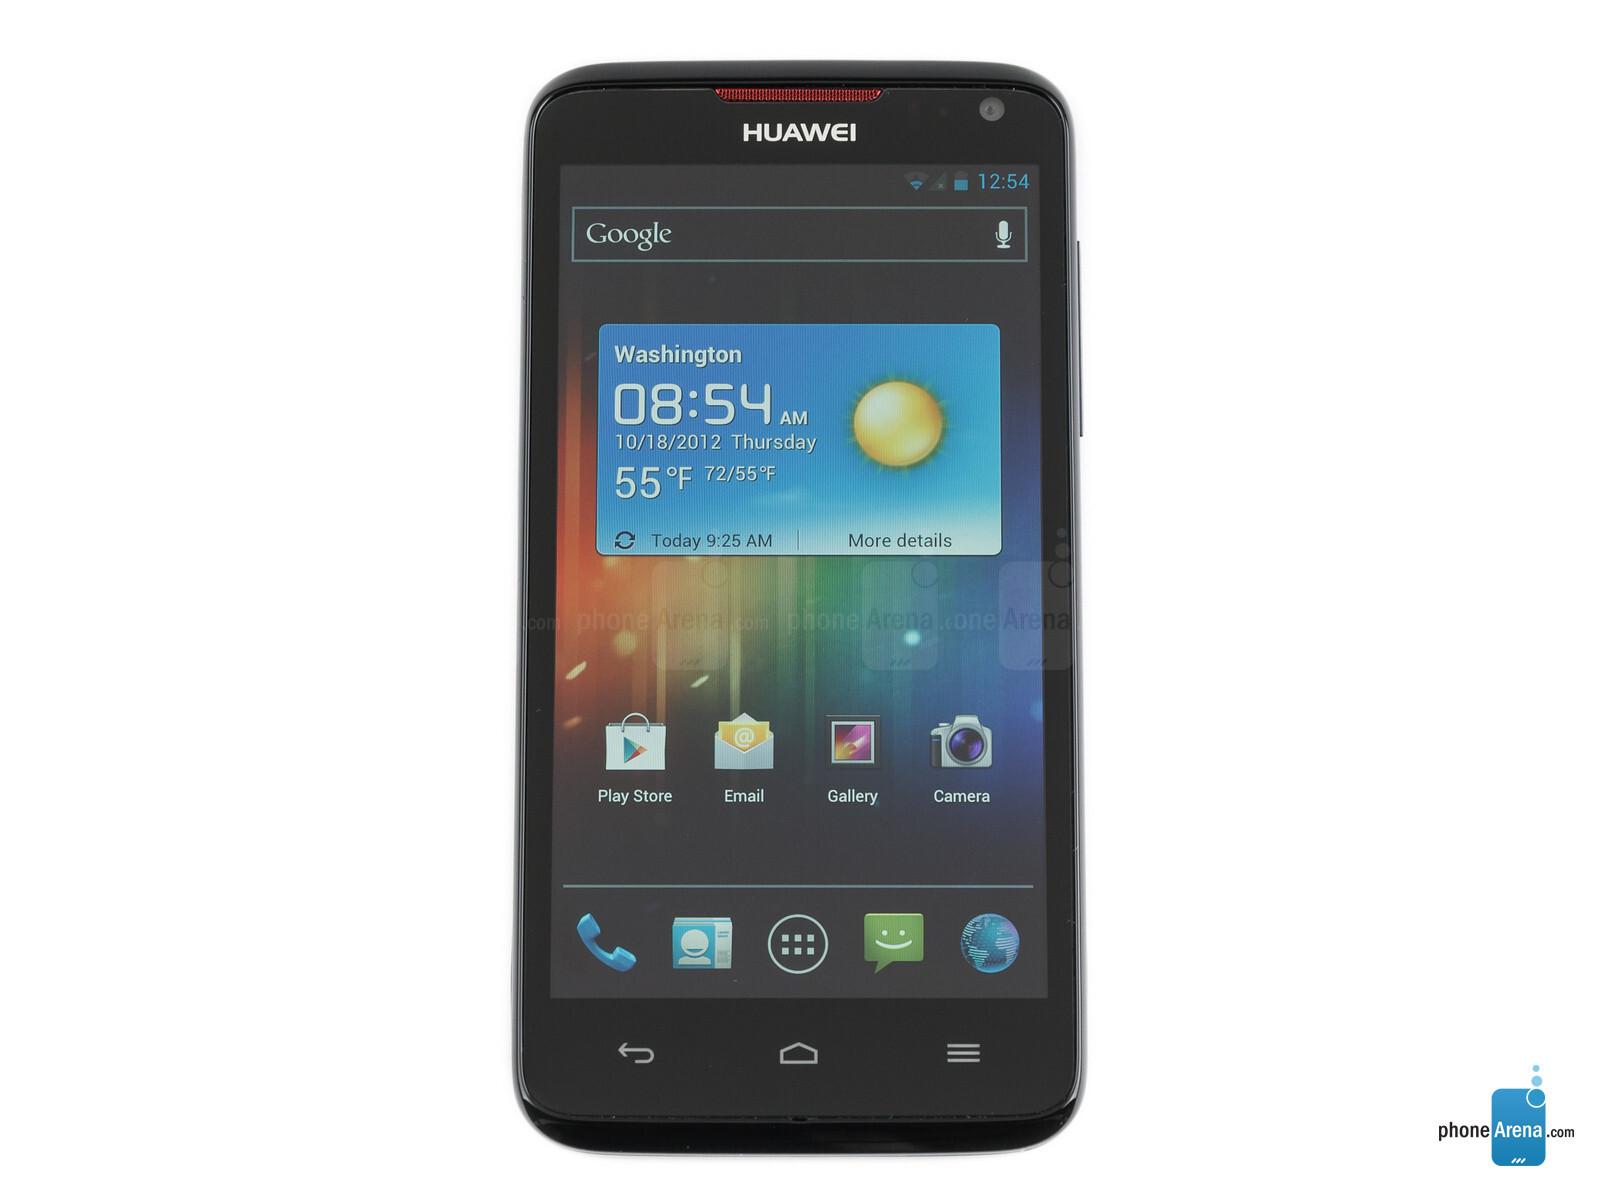 Huawei Ascend D1 Quad Xl Specs